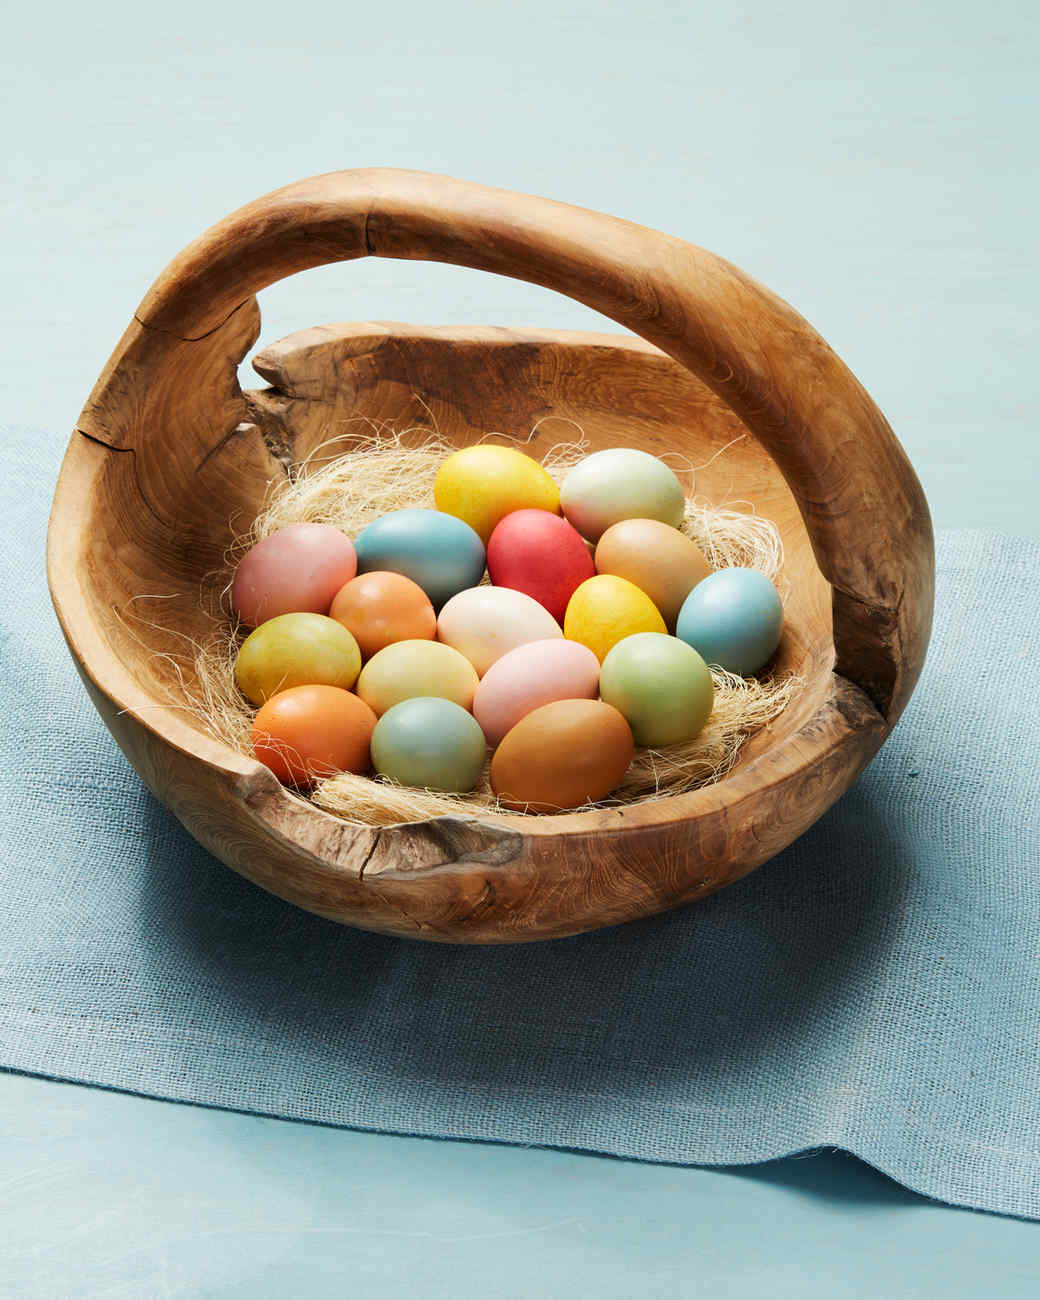 Basket of coloured Easter eggs